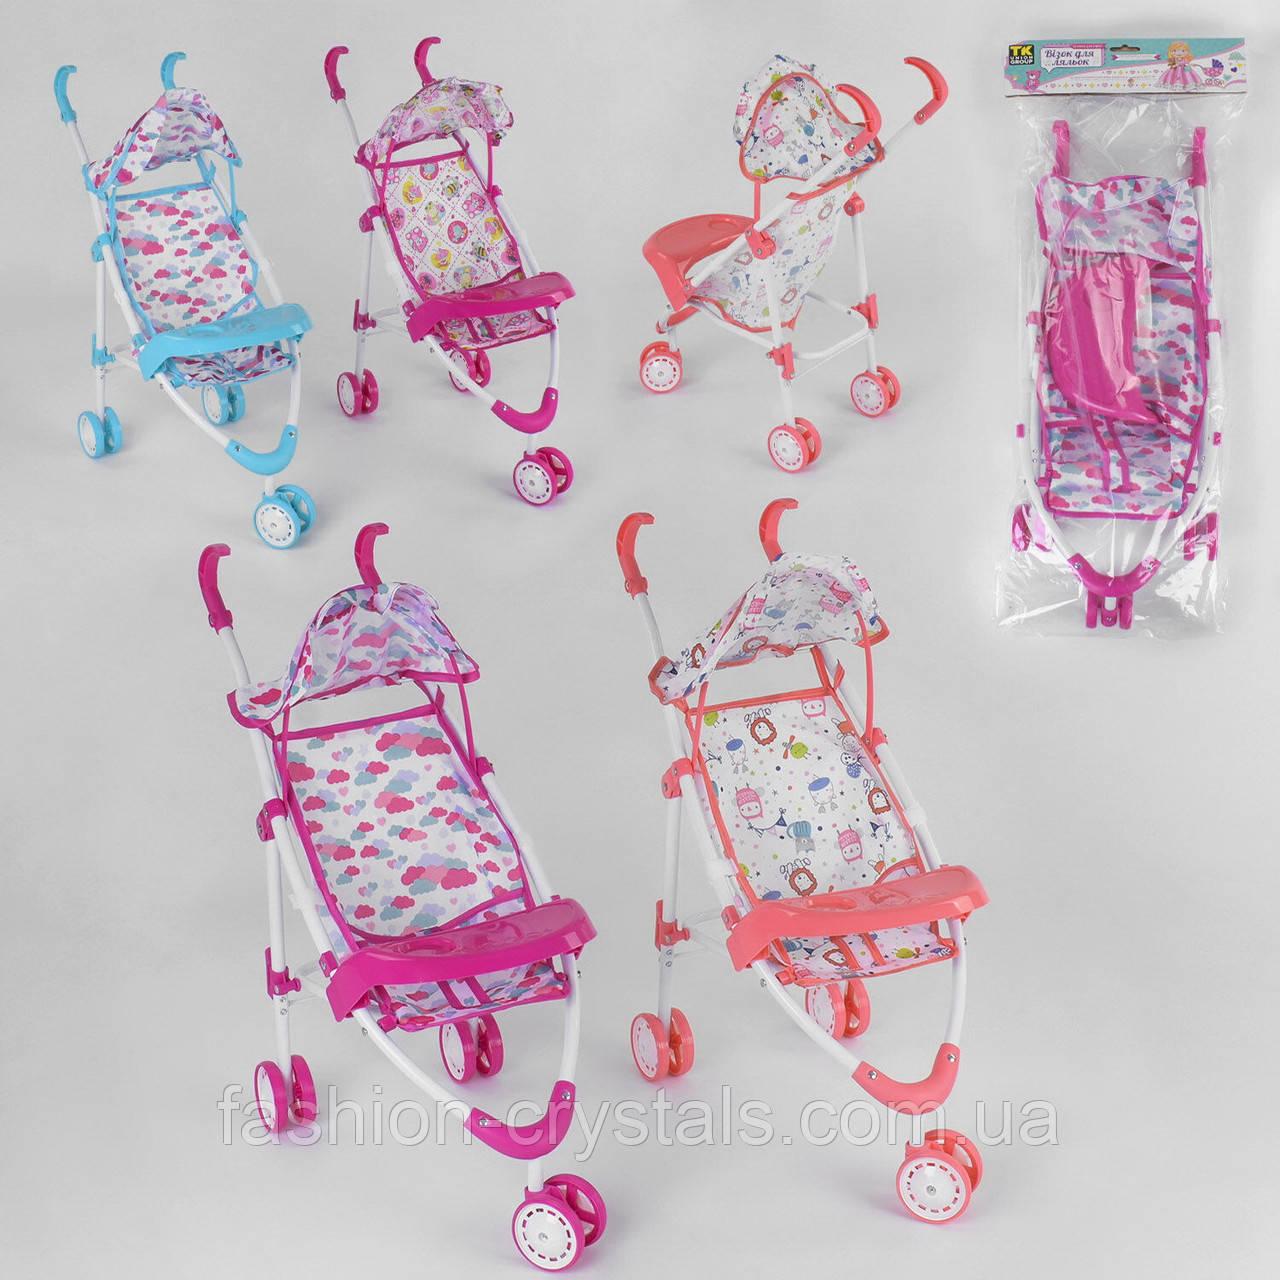 Детская прогулочная коляска для кукол 2025